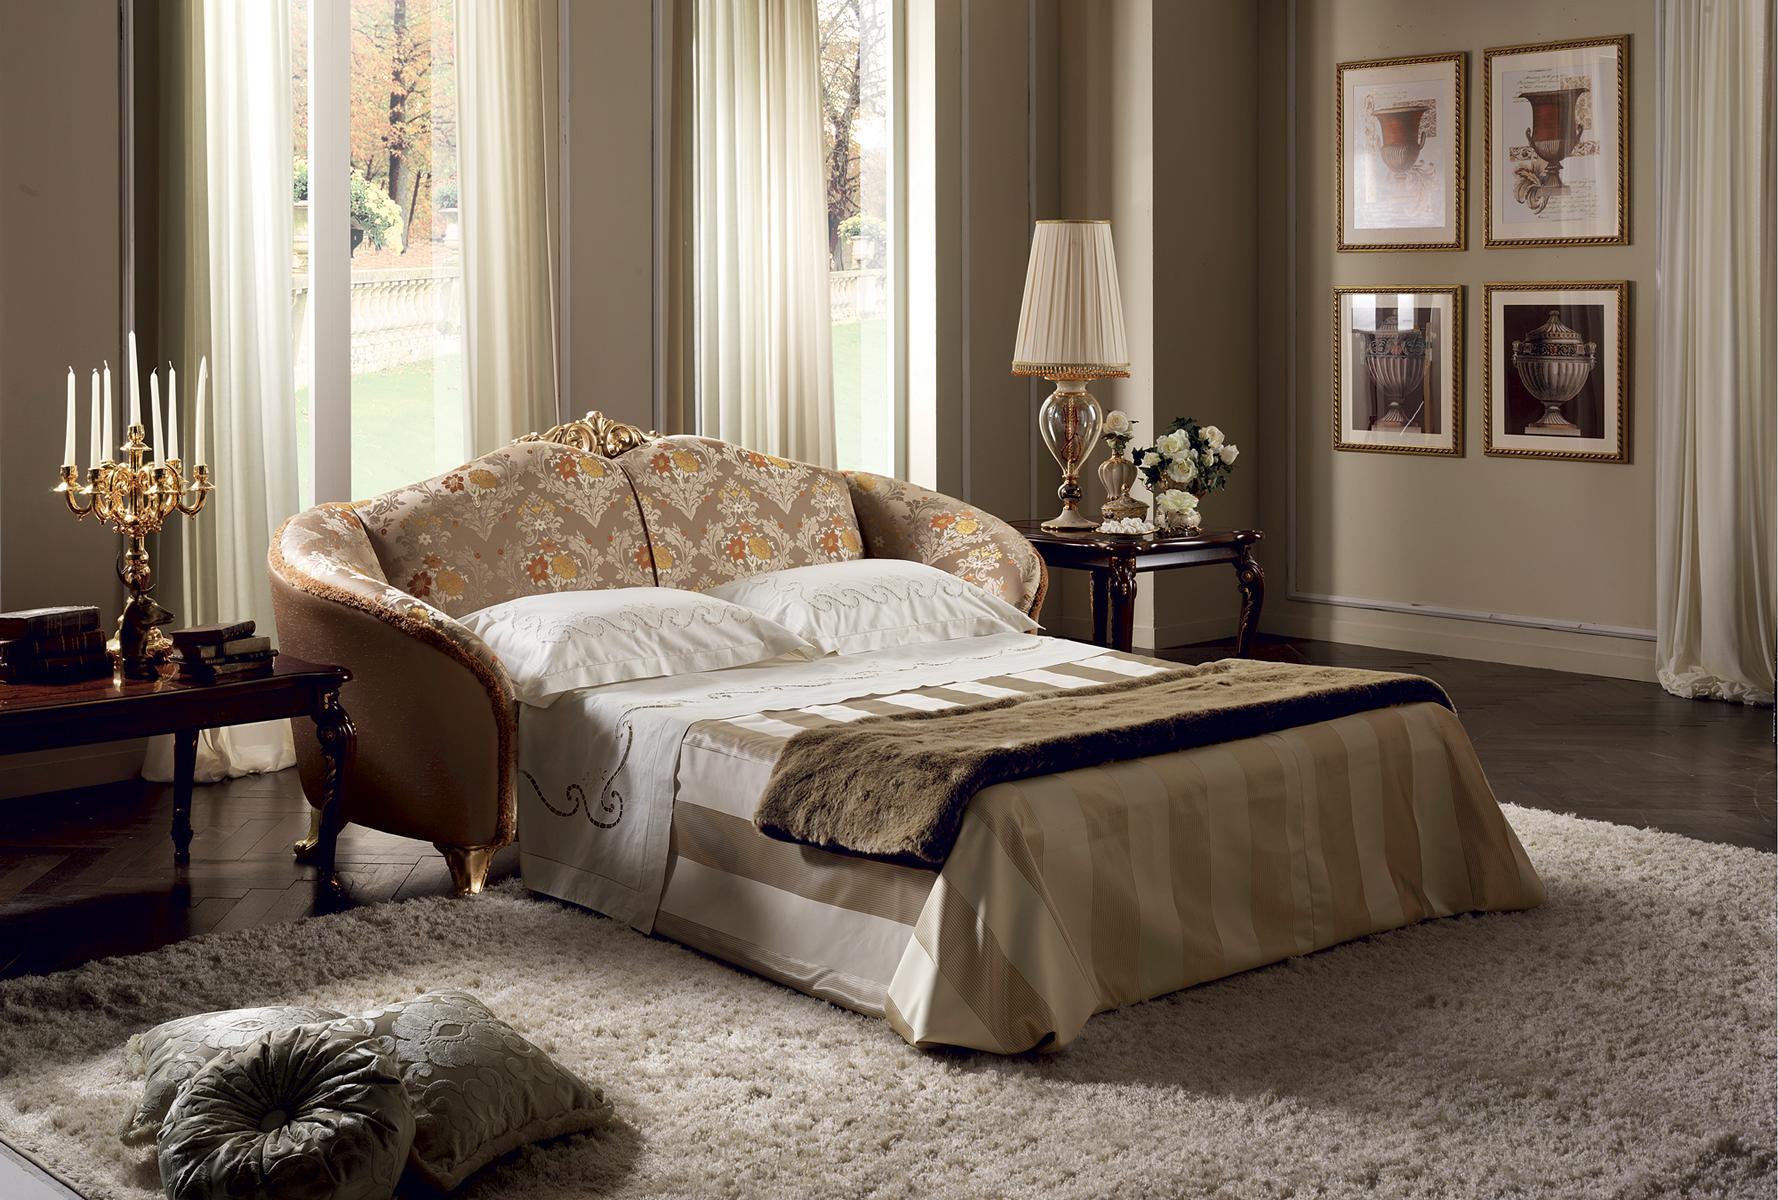 arredoclassic™ 3 Sitzer Couch Sofa Polster Couchen Schlafsofa Bettfunktion Neu